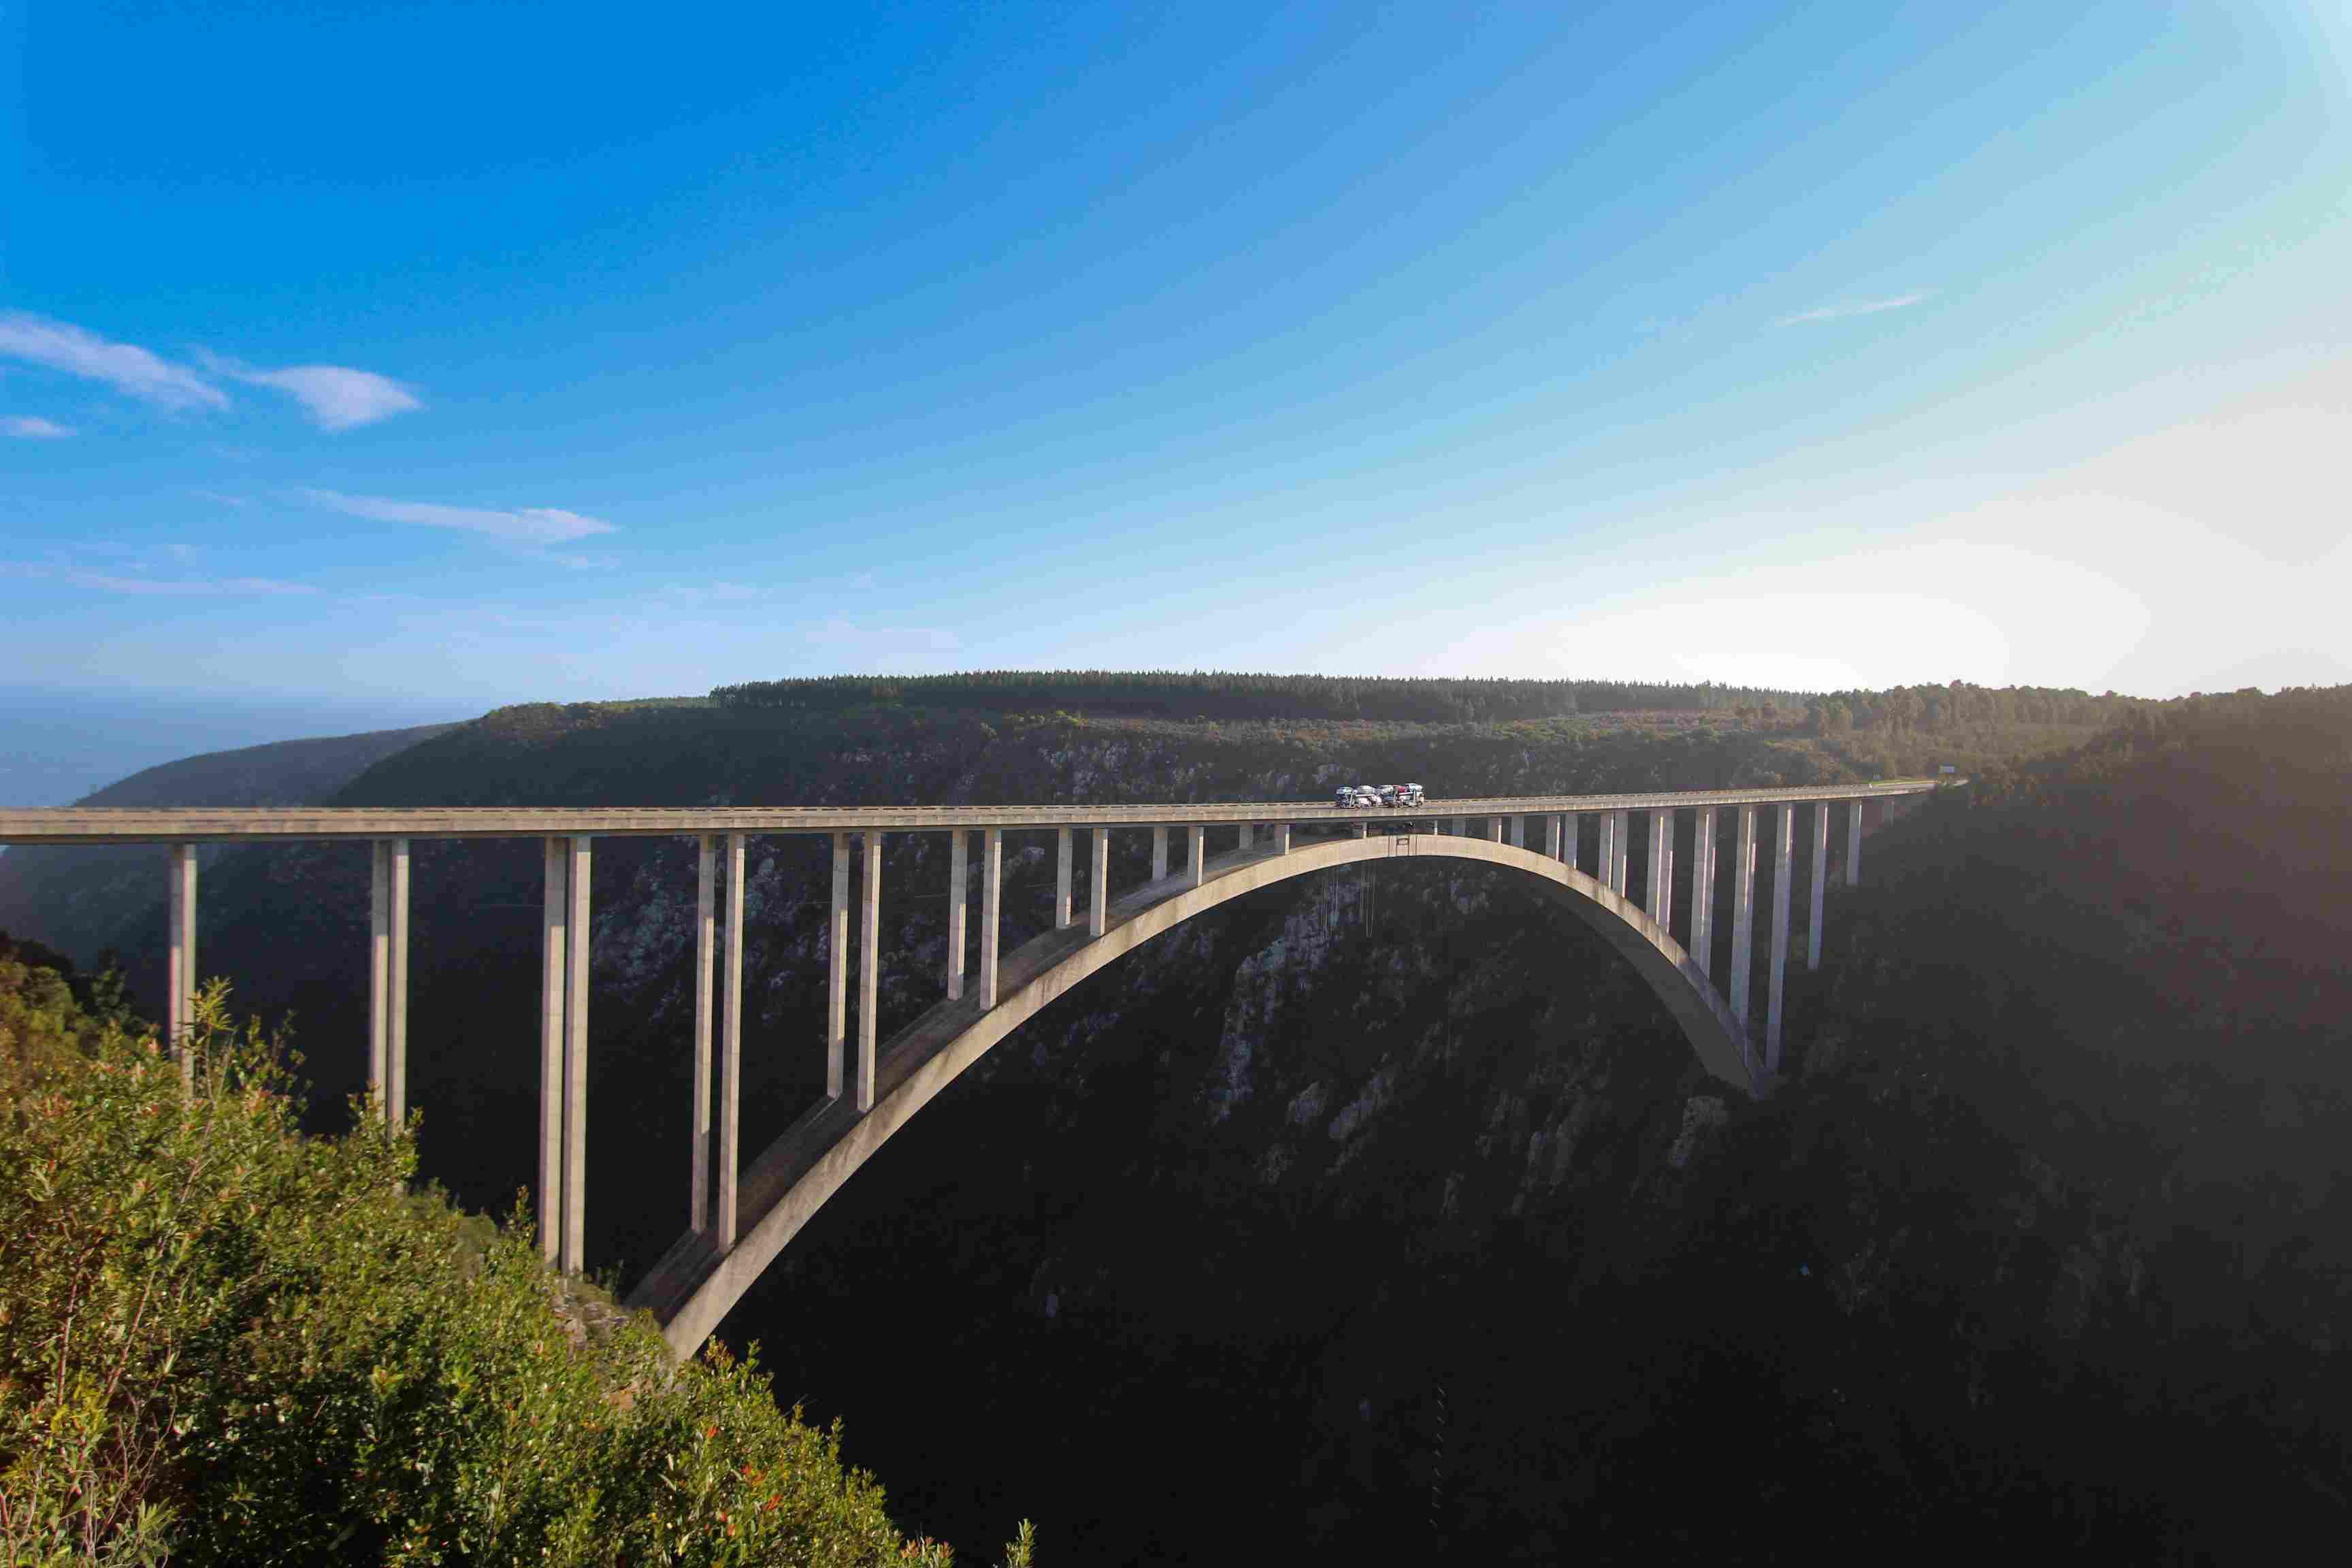 The Bloukrans Bridge near Western Cape, South Africa